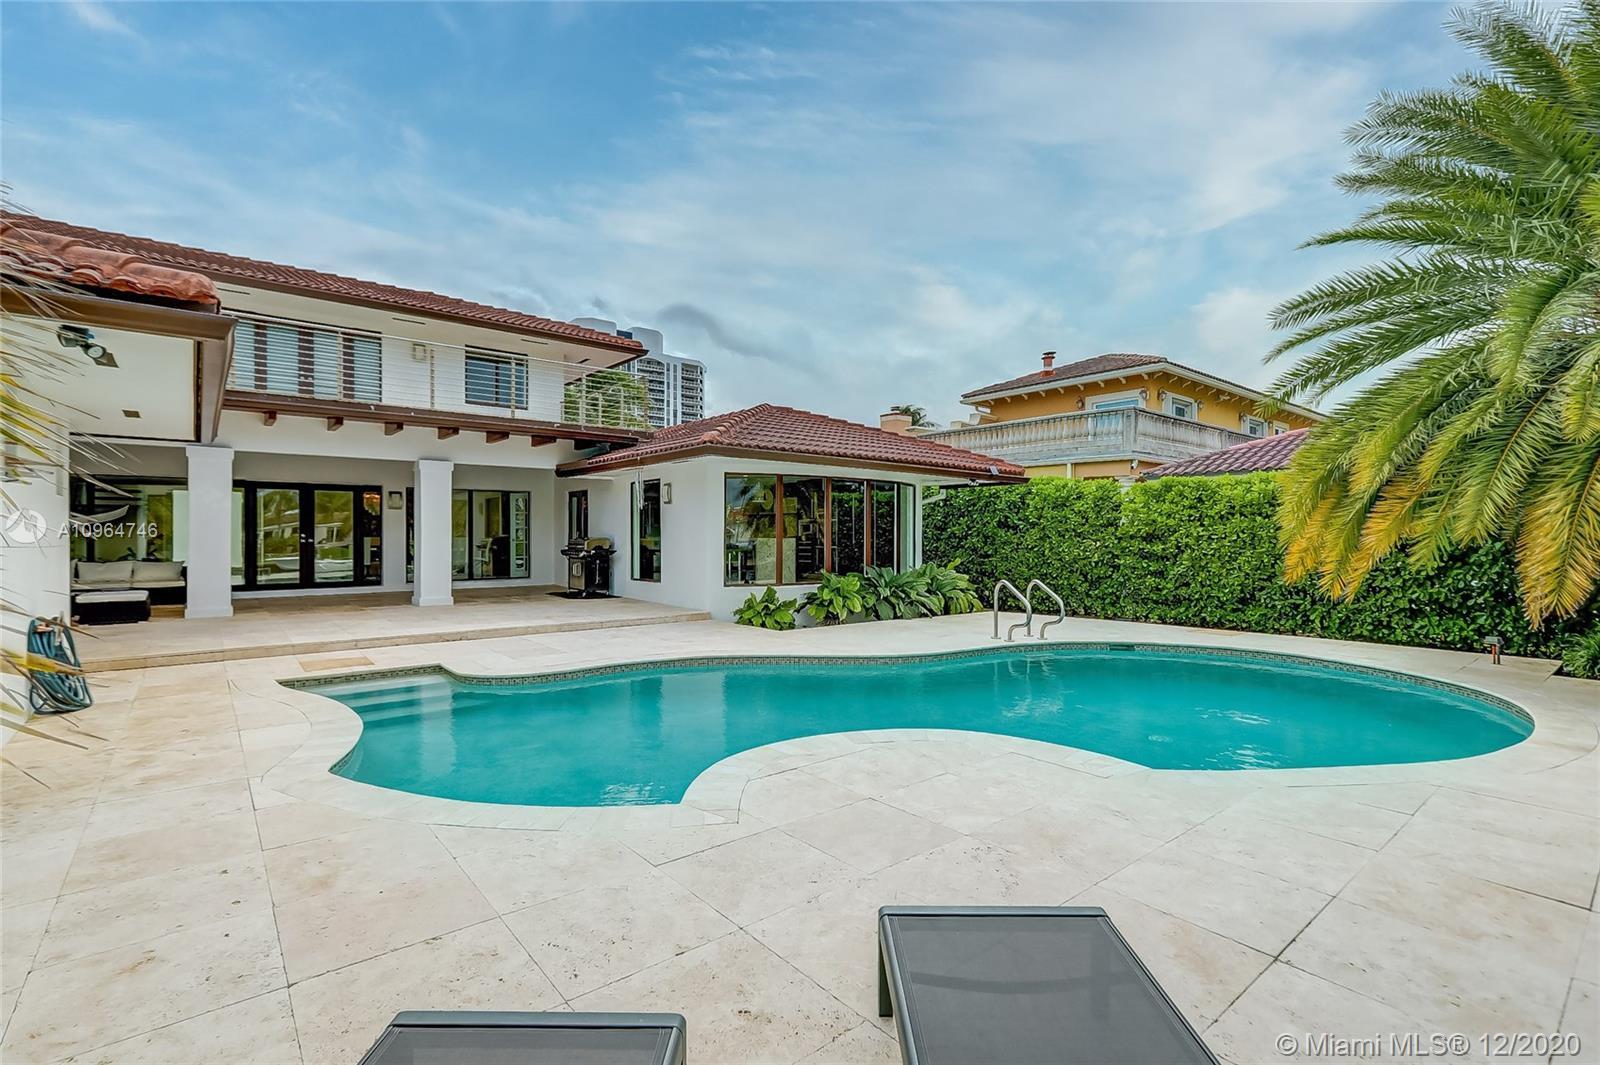 Golden Isles - 418 Holiday Dr, Hallandale Beach, FL 33009